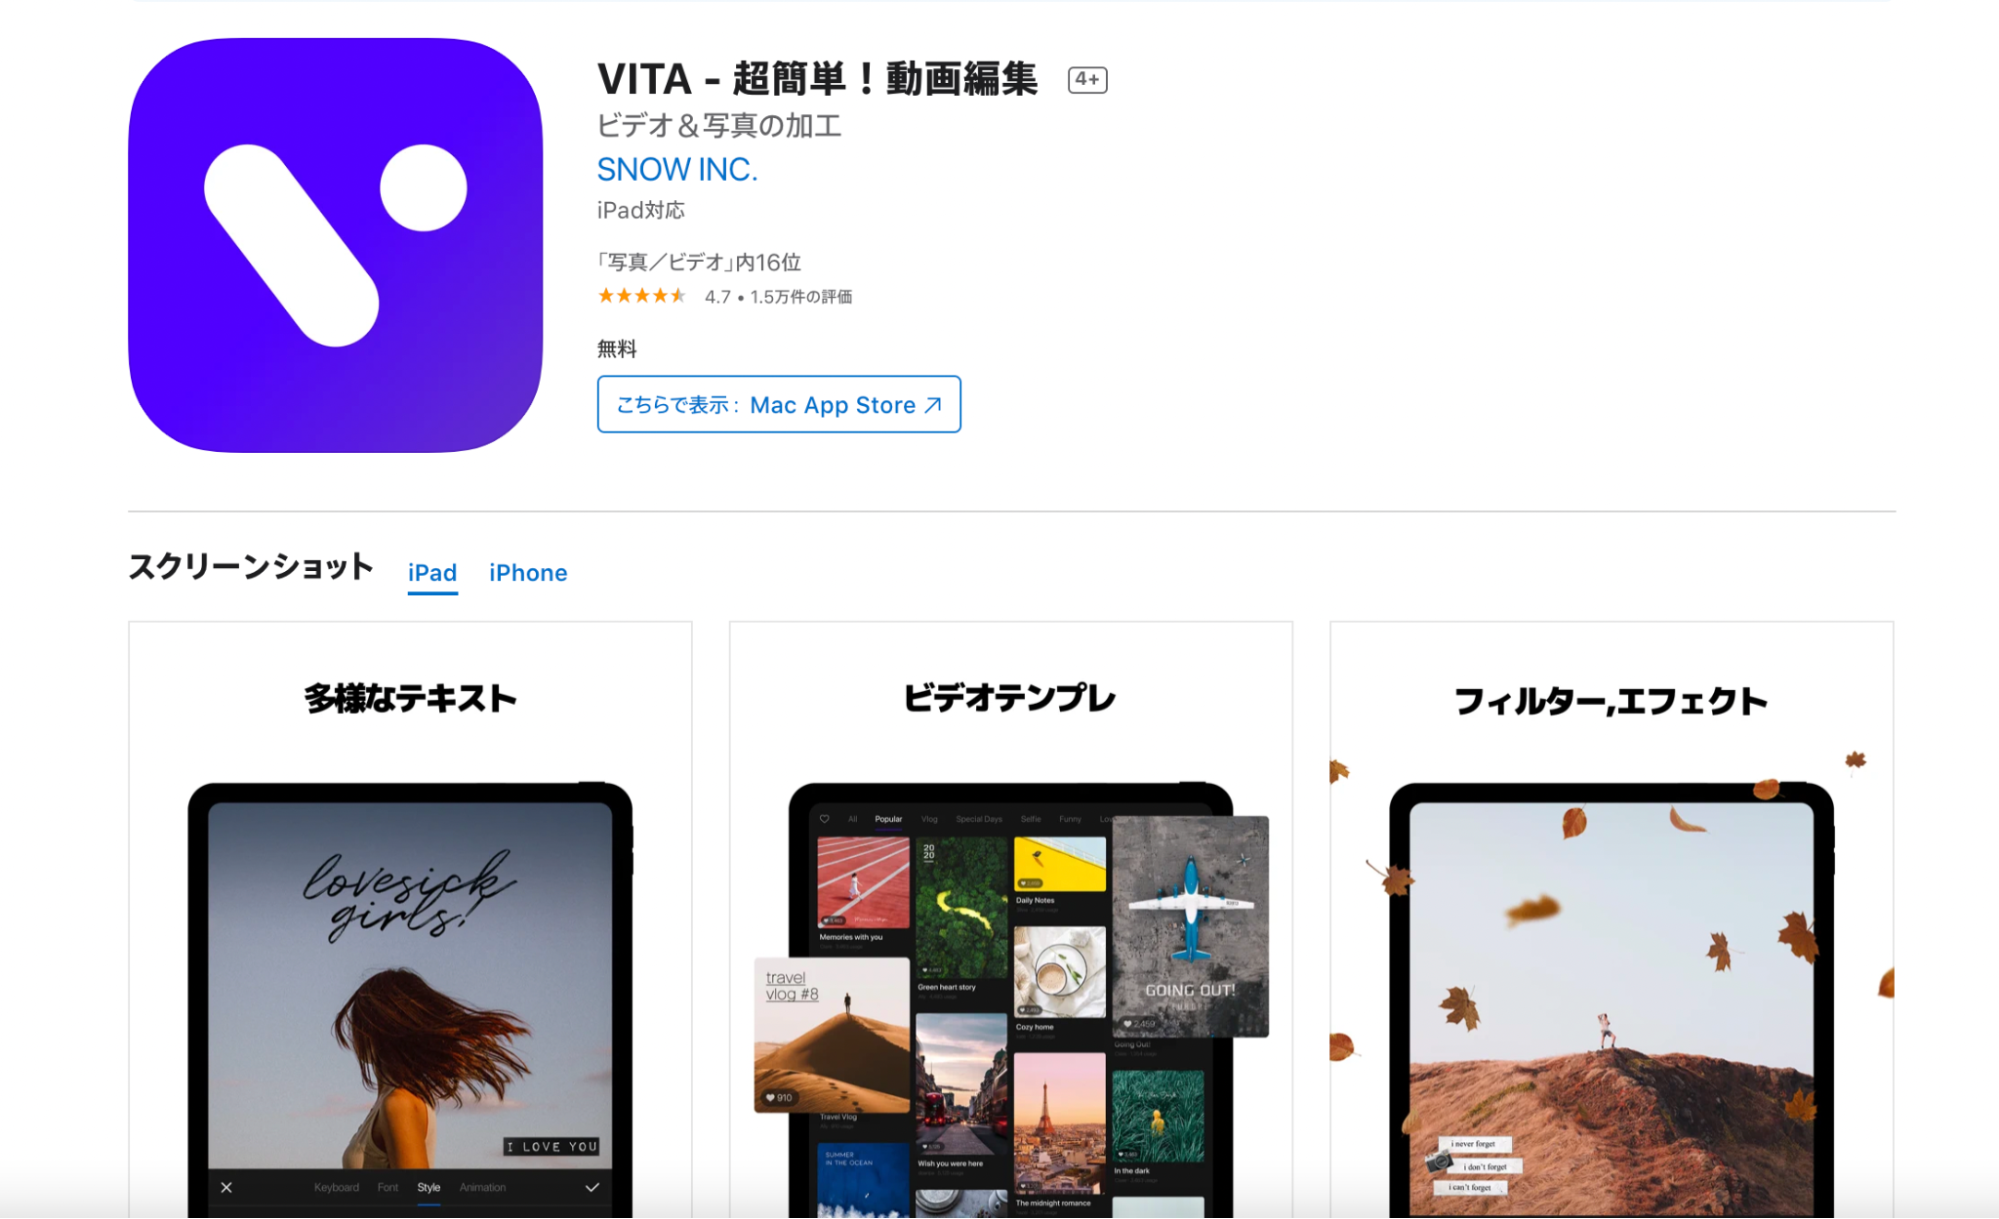 vitaのWebサイトトップ画面